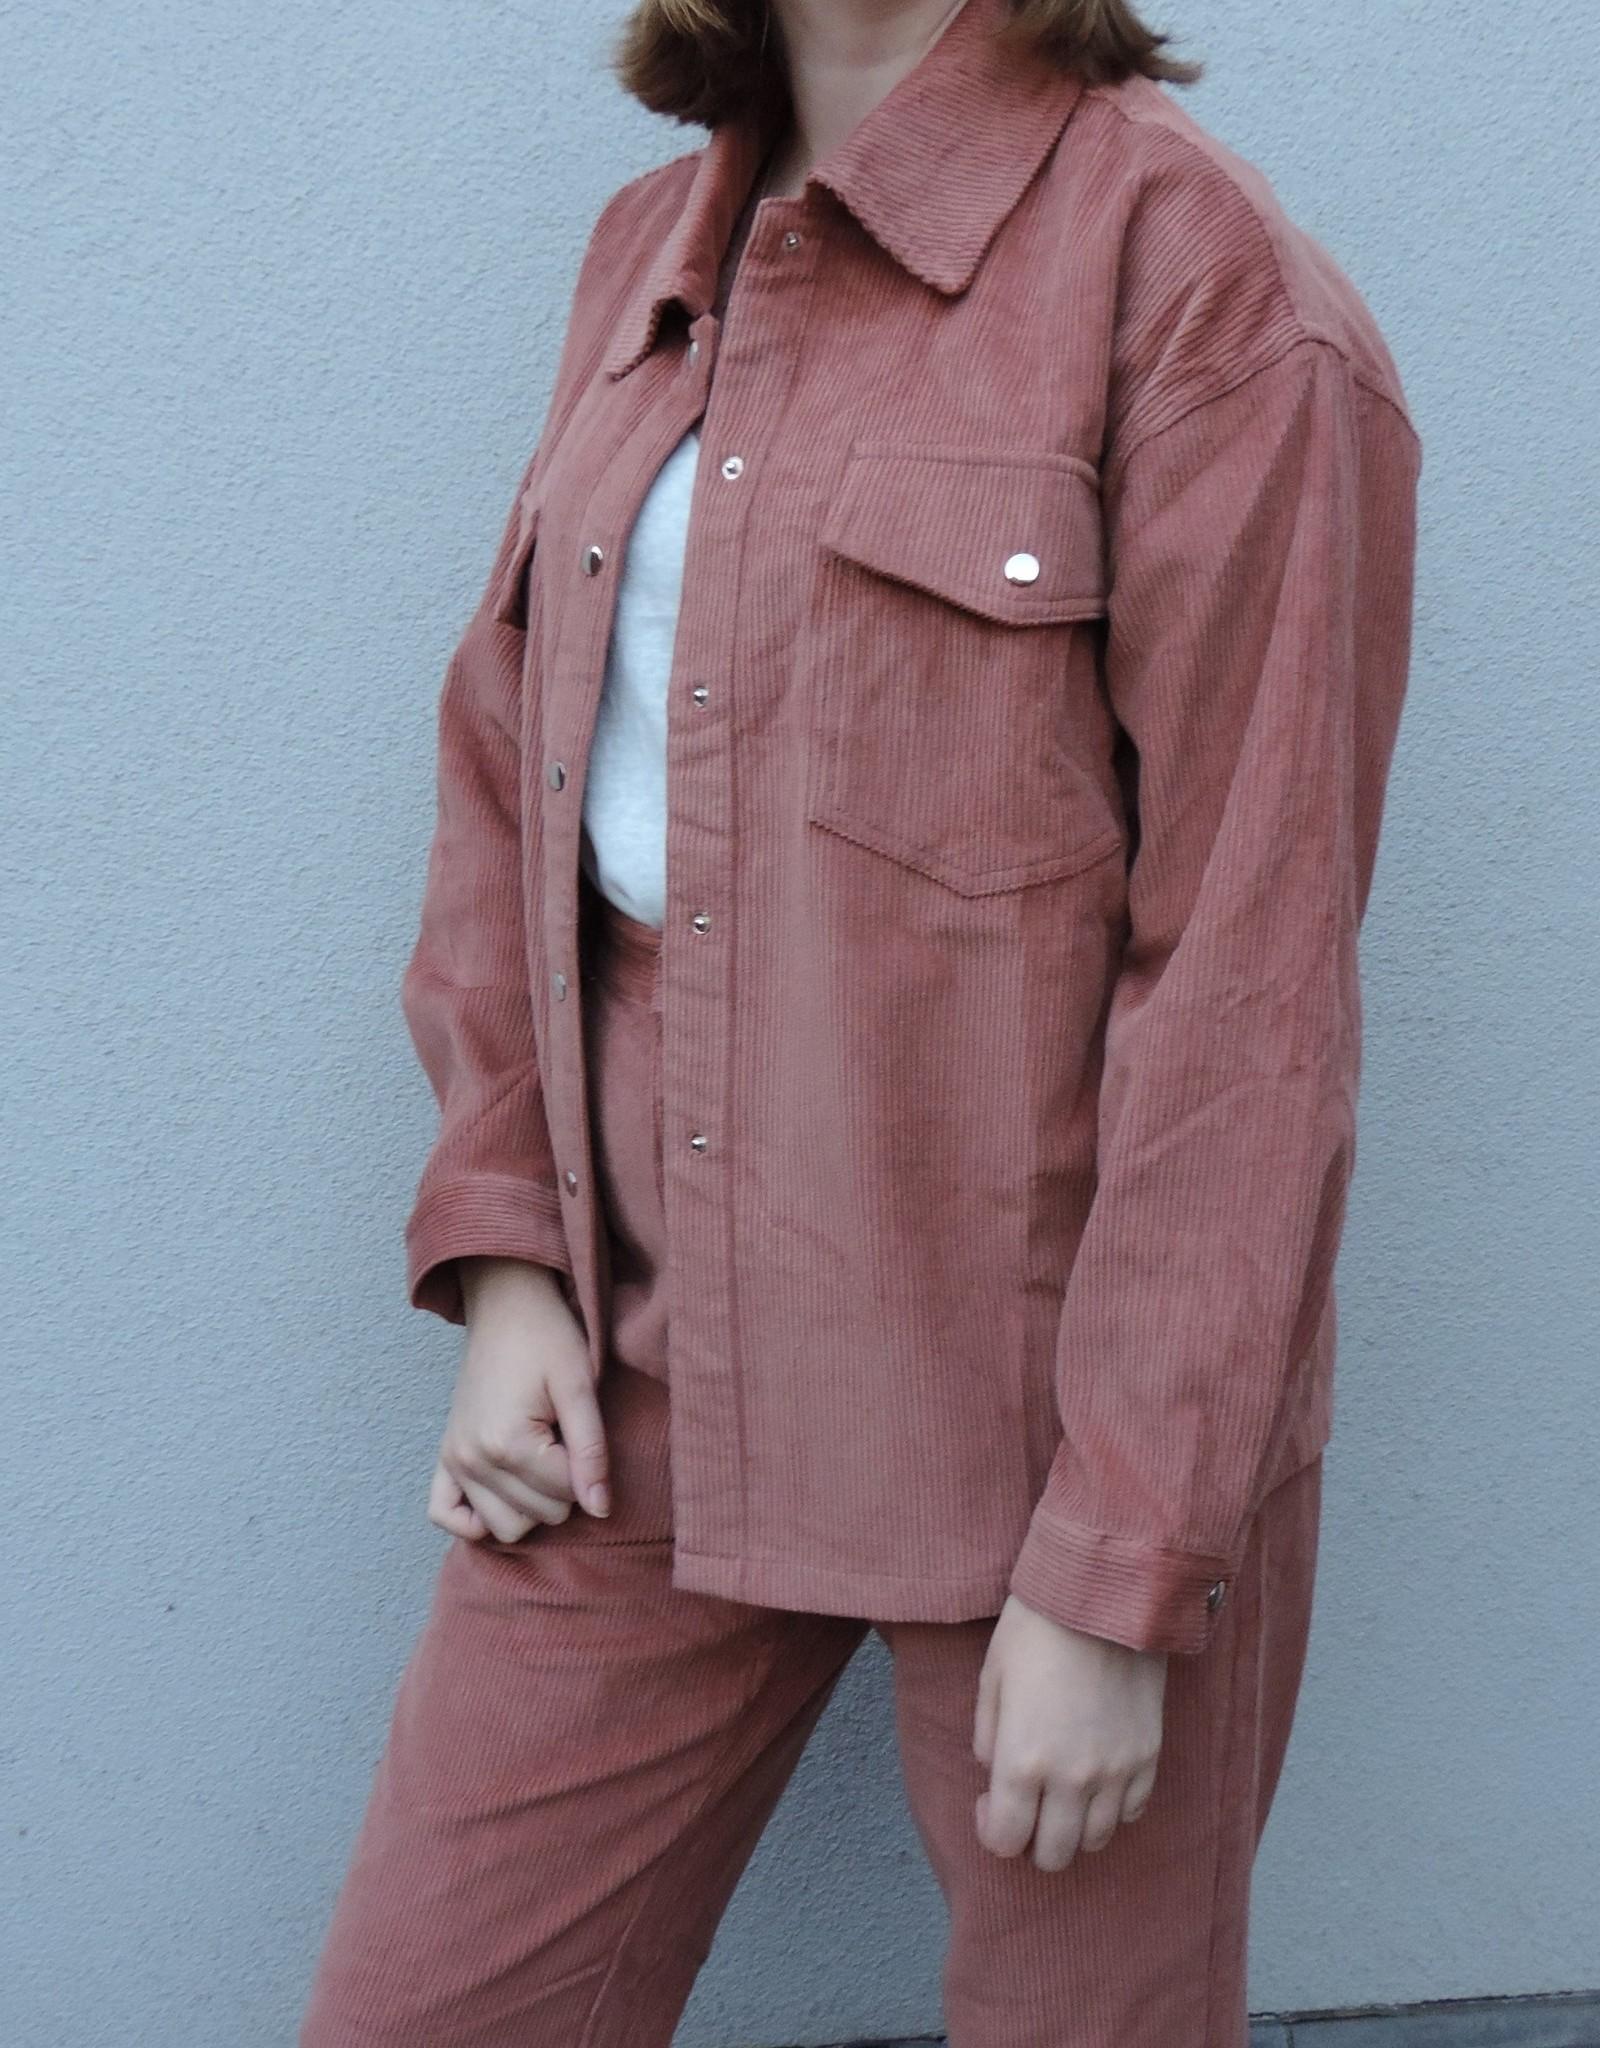 Blanche jacket